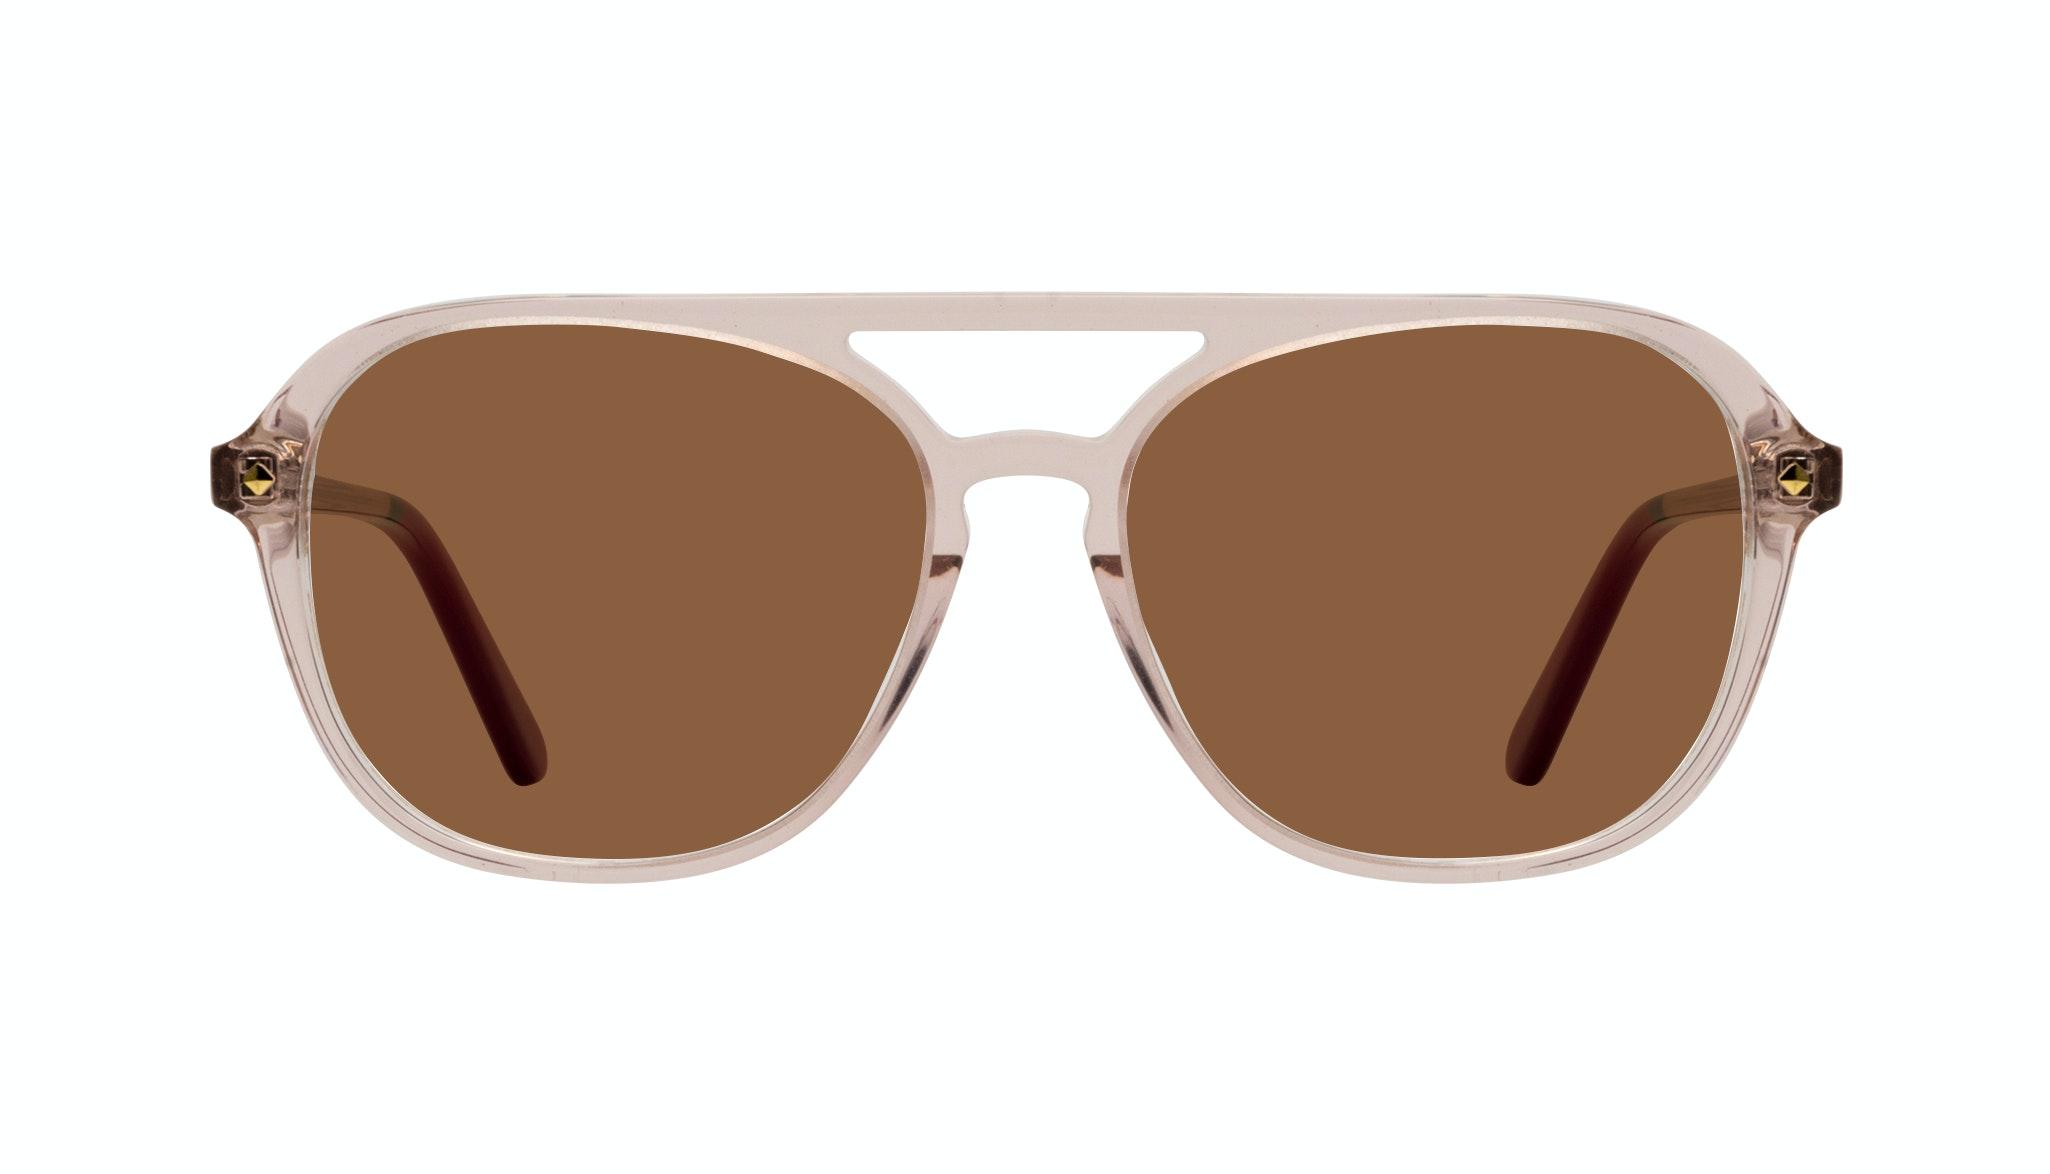 Affordable Fashion Glasses Aviator Sunglasses Women Jerry Rose